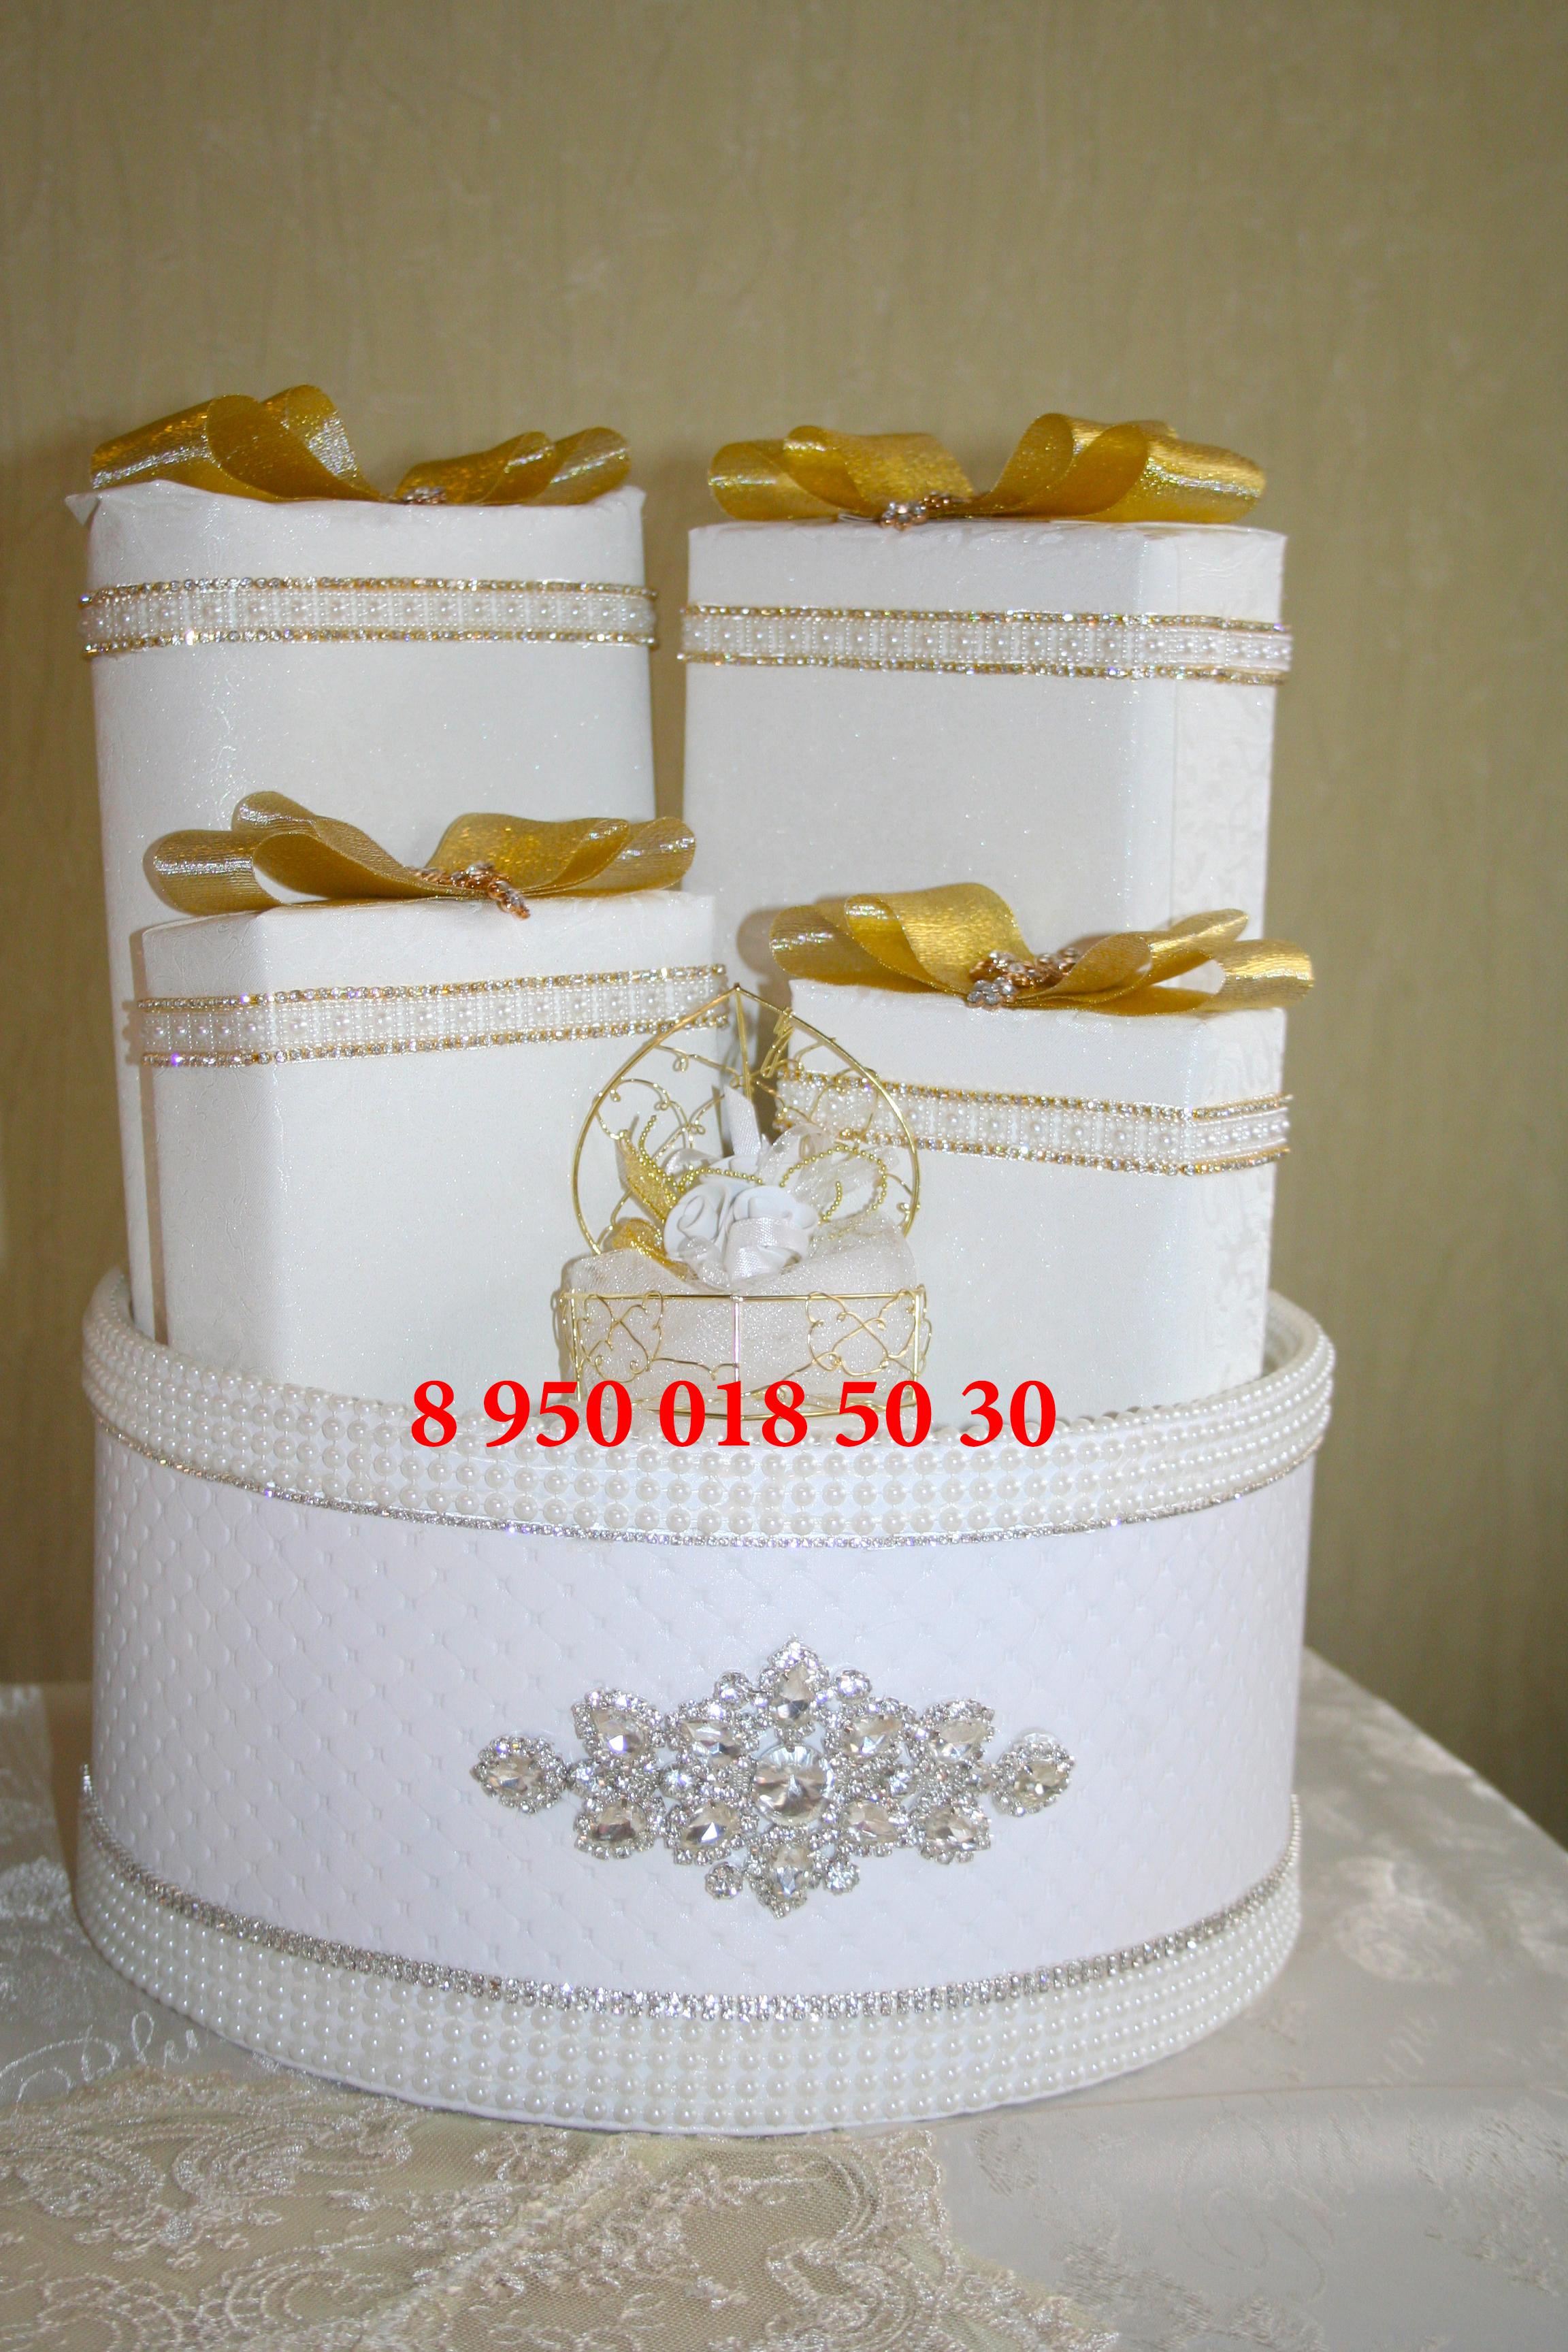 прокат свадебных корзин, таросики